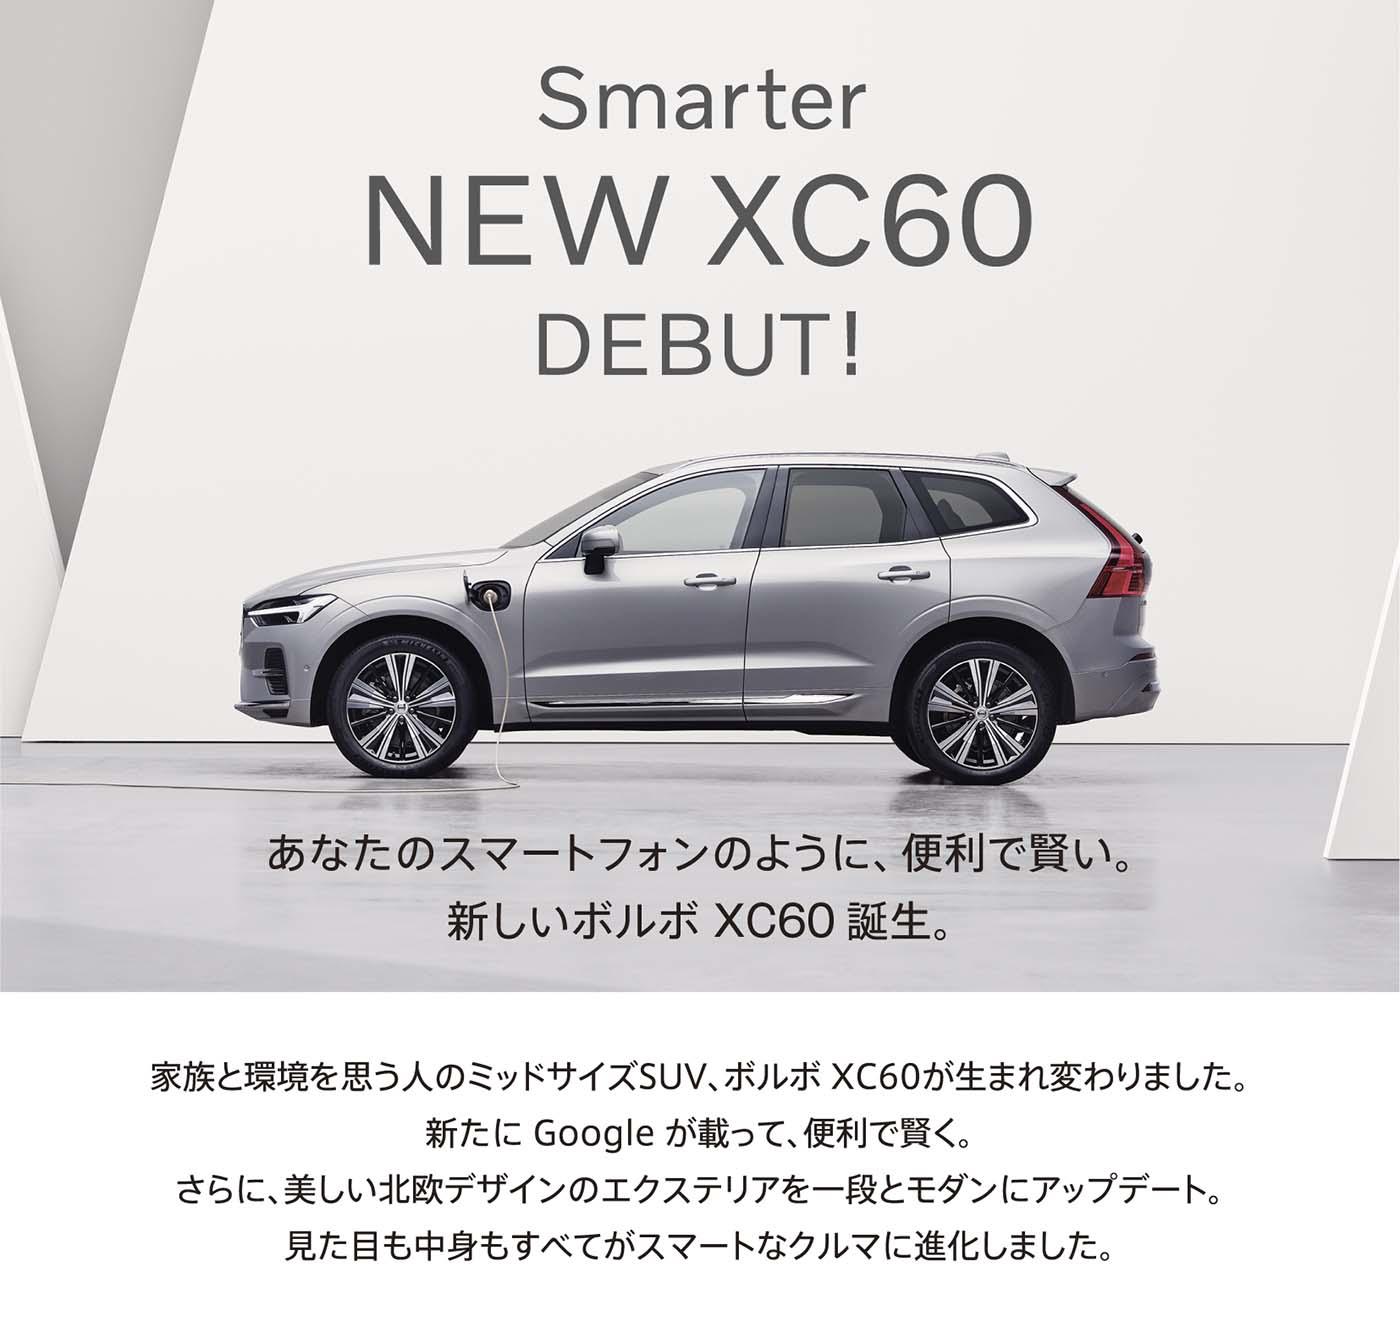 Smarter NEW XC60 DEBUT!